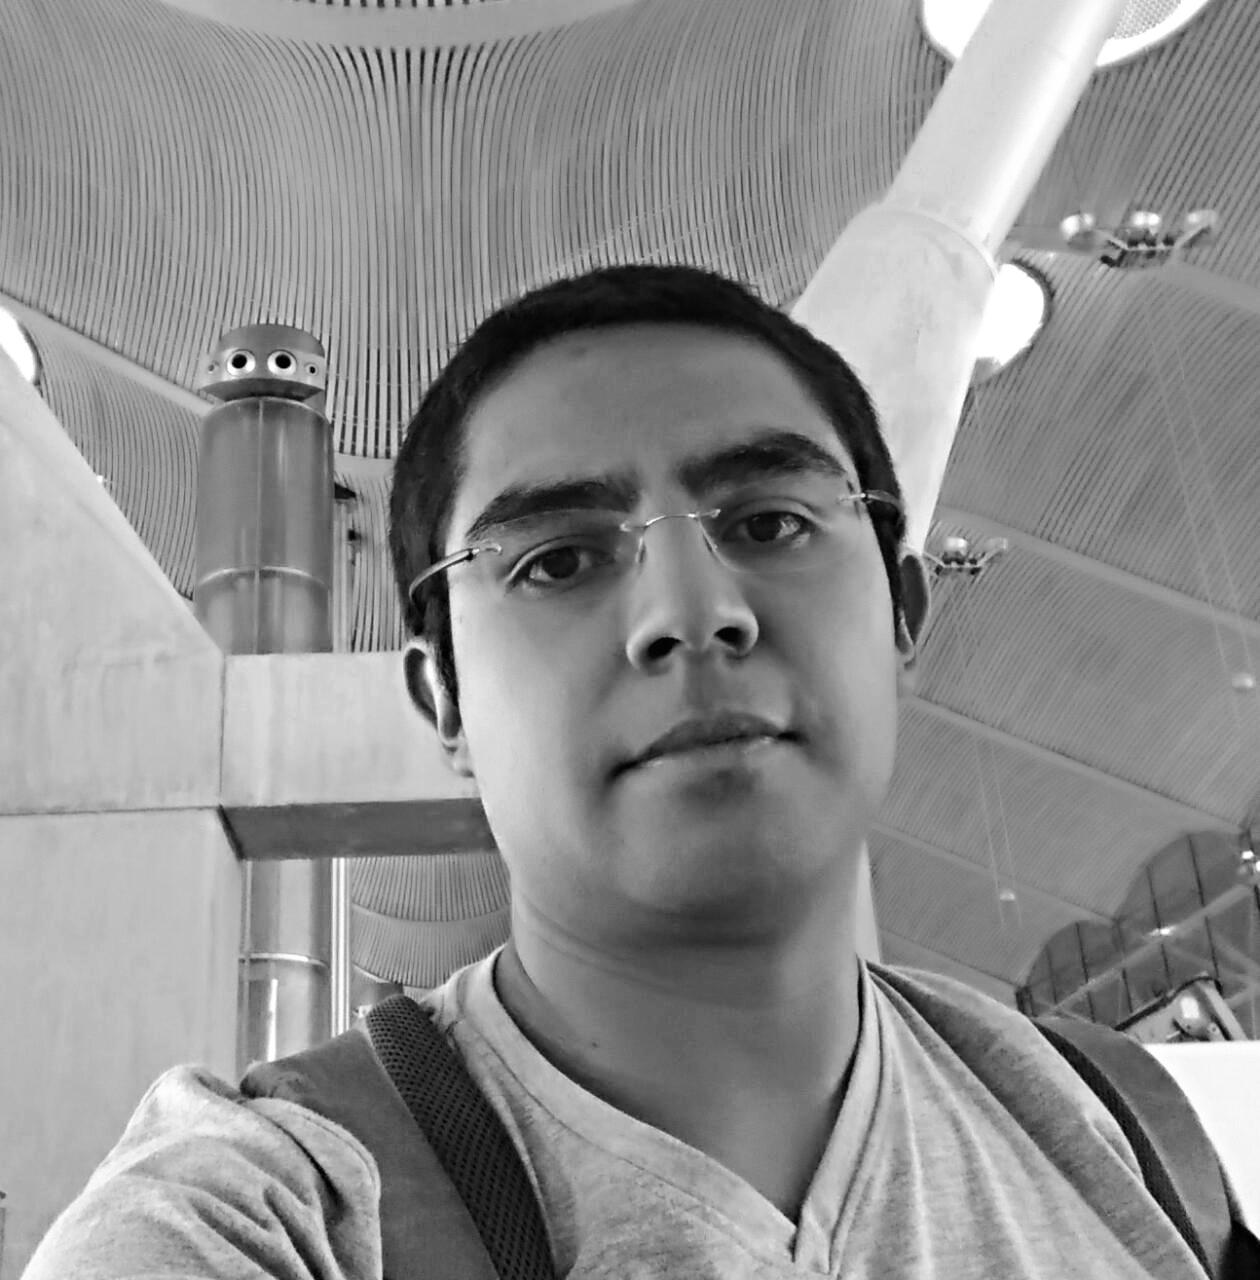 Andres Felipe Jurado